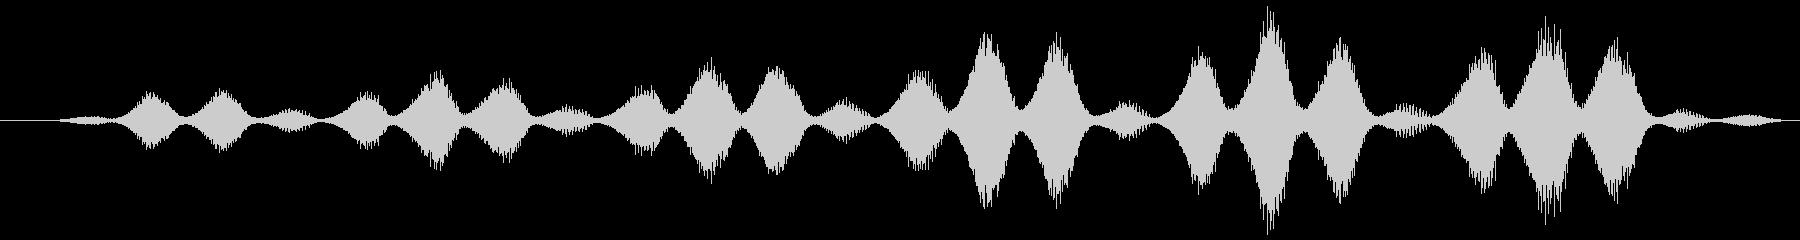 SPACE RETINAL SCA...の未再生の波形